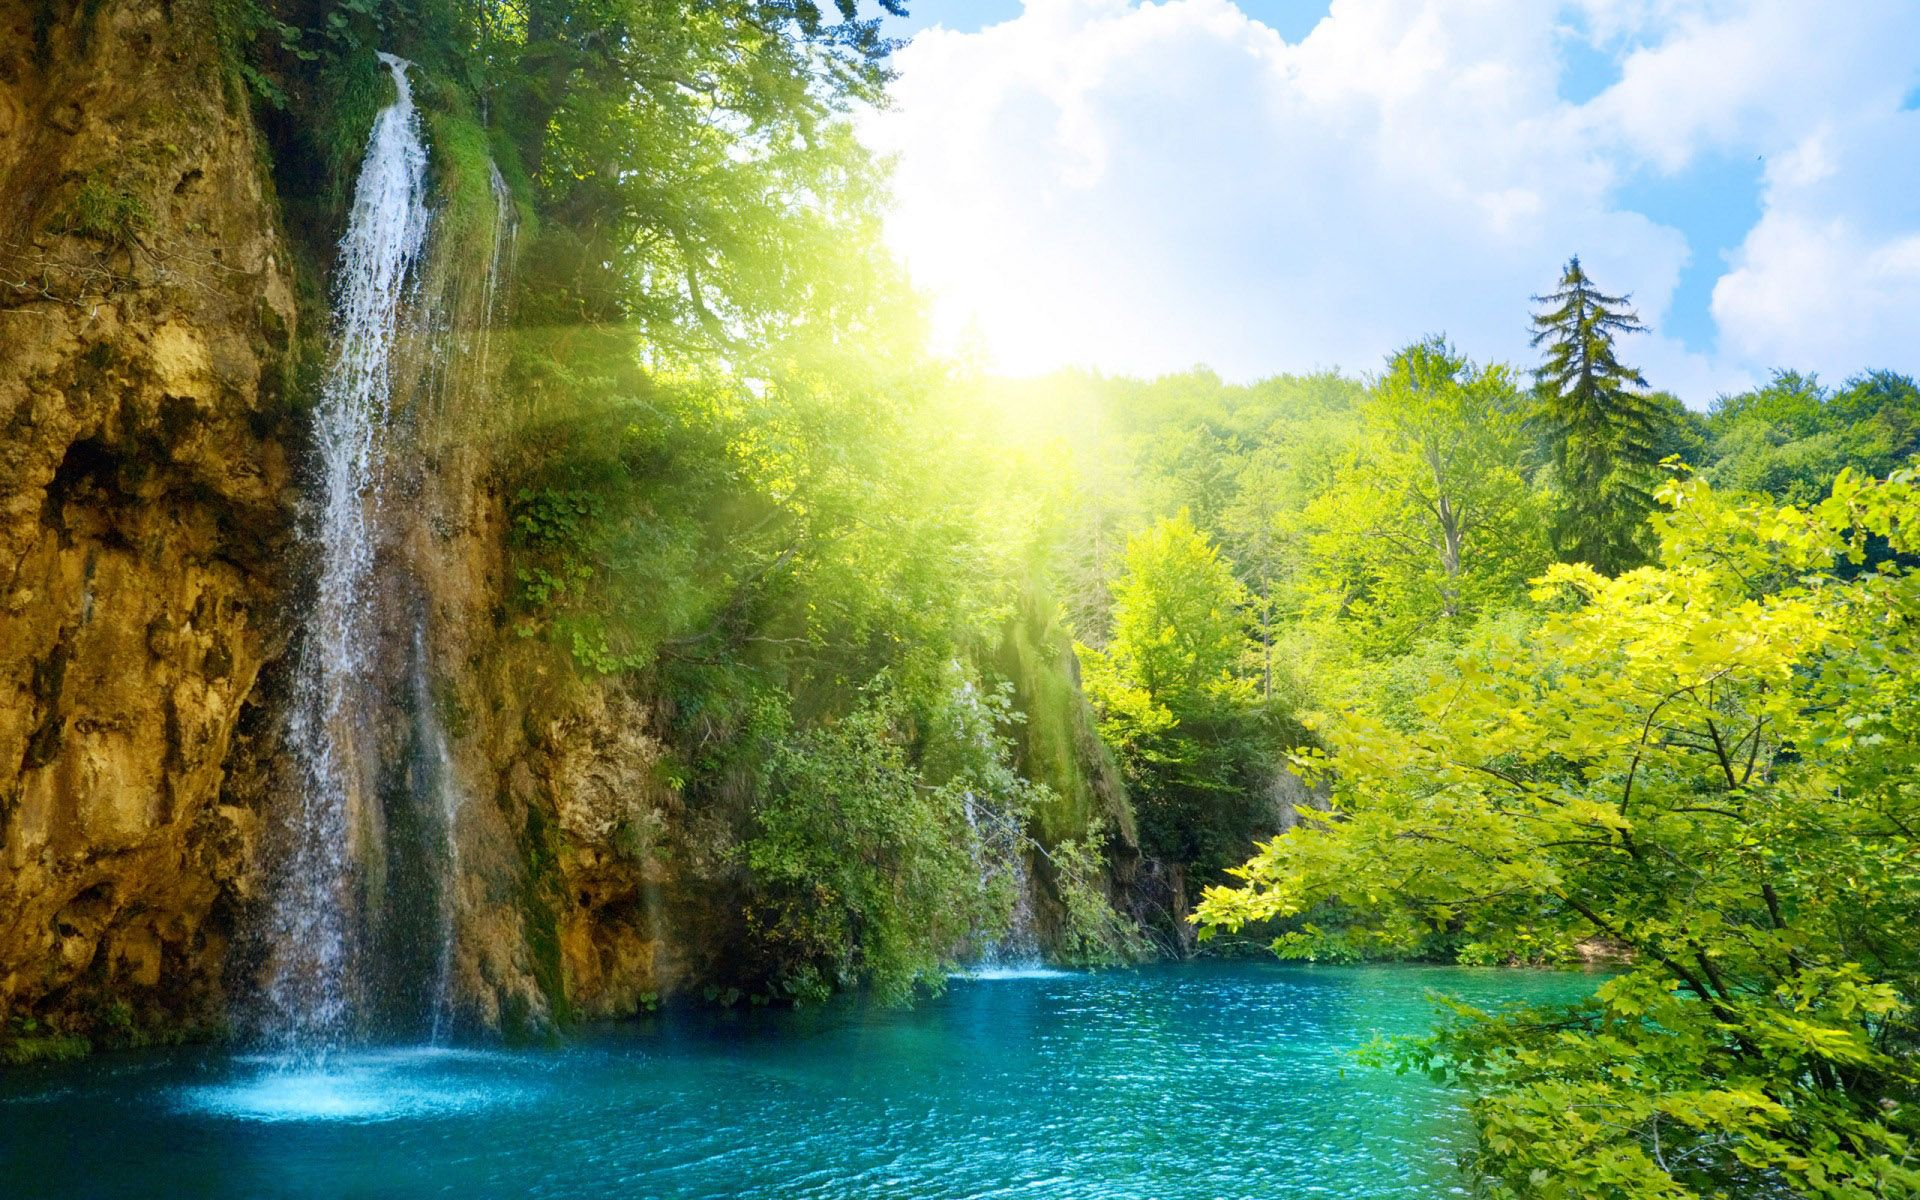 Widescreen Waterfall Nature Wallpaper Download Waterfall Wallpaper Waterfall Nature